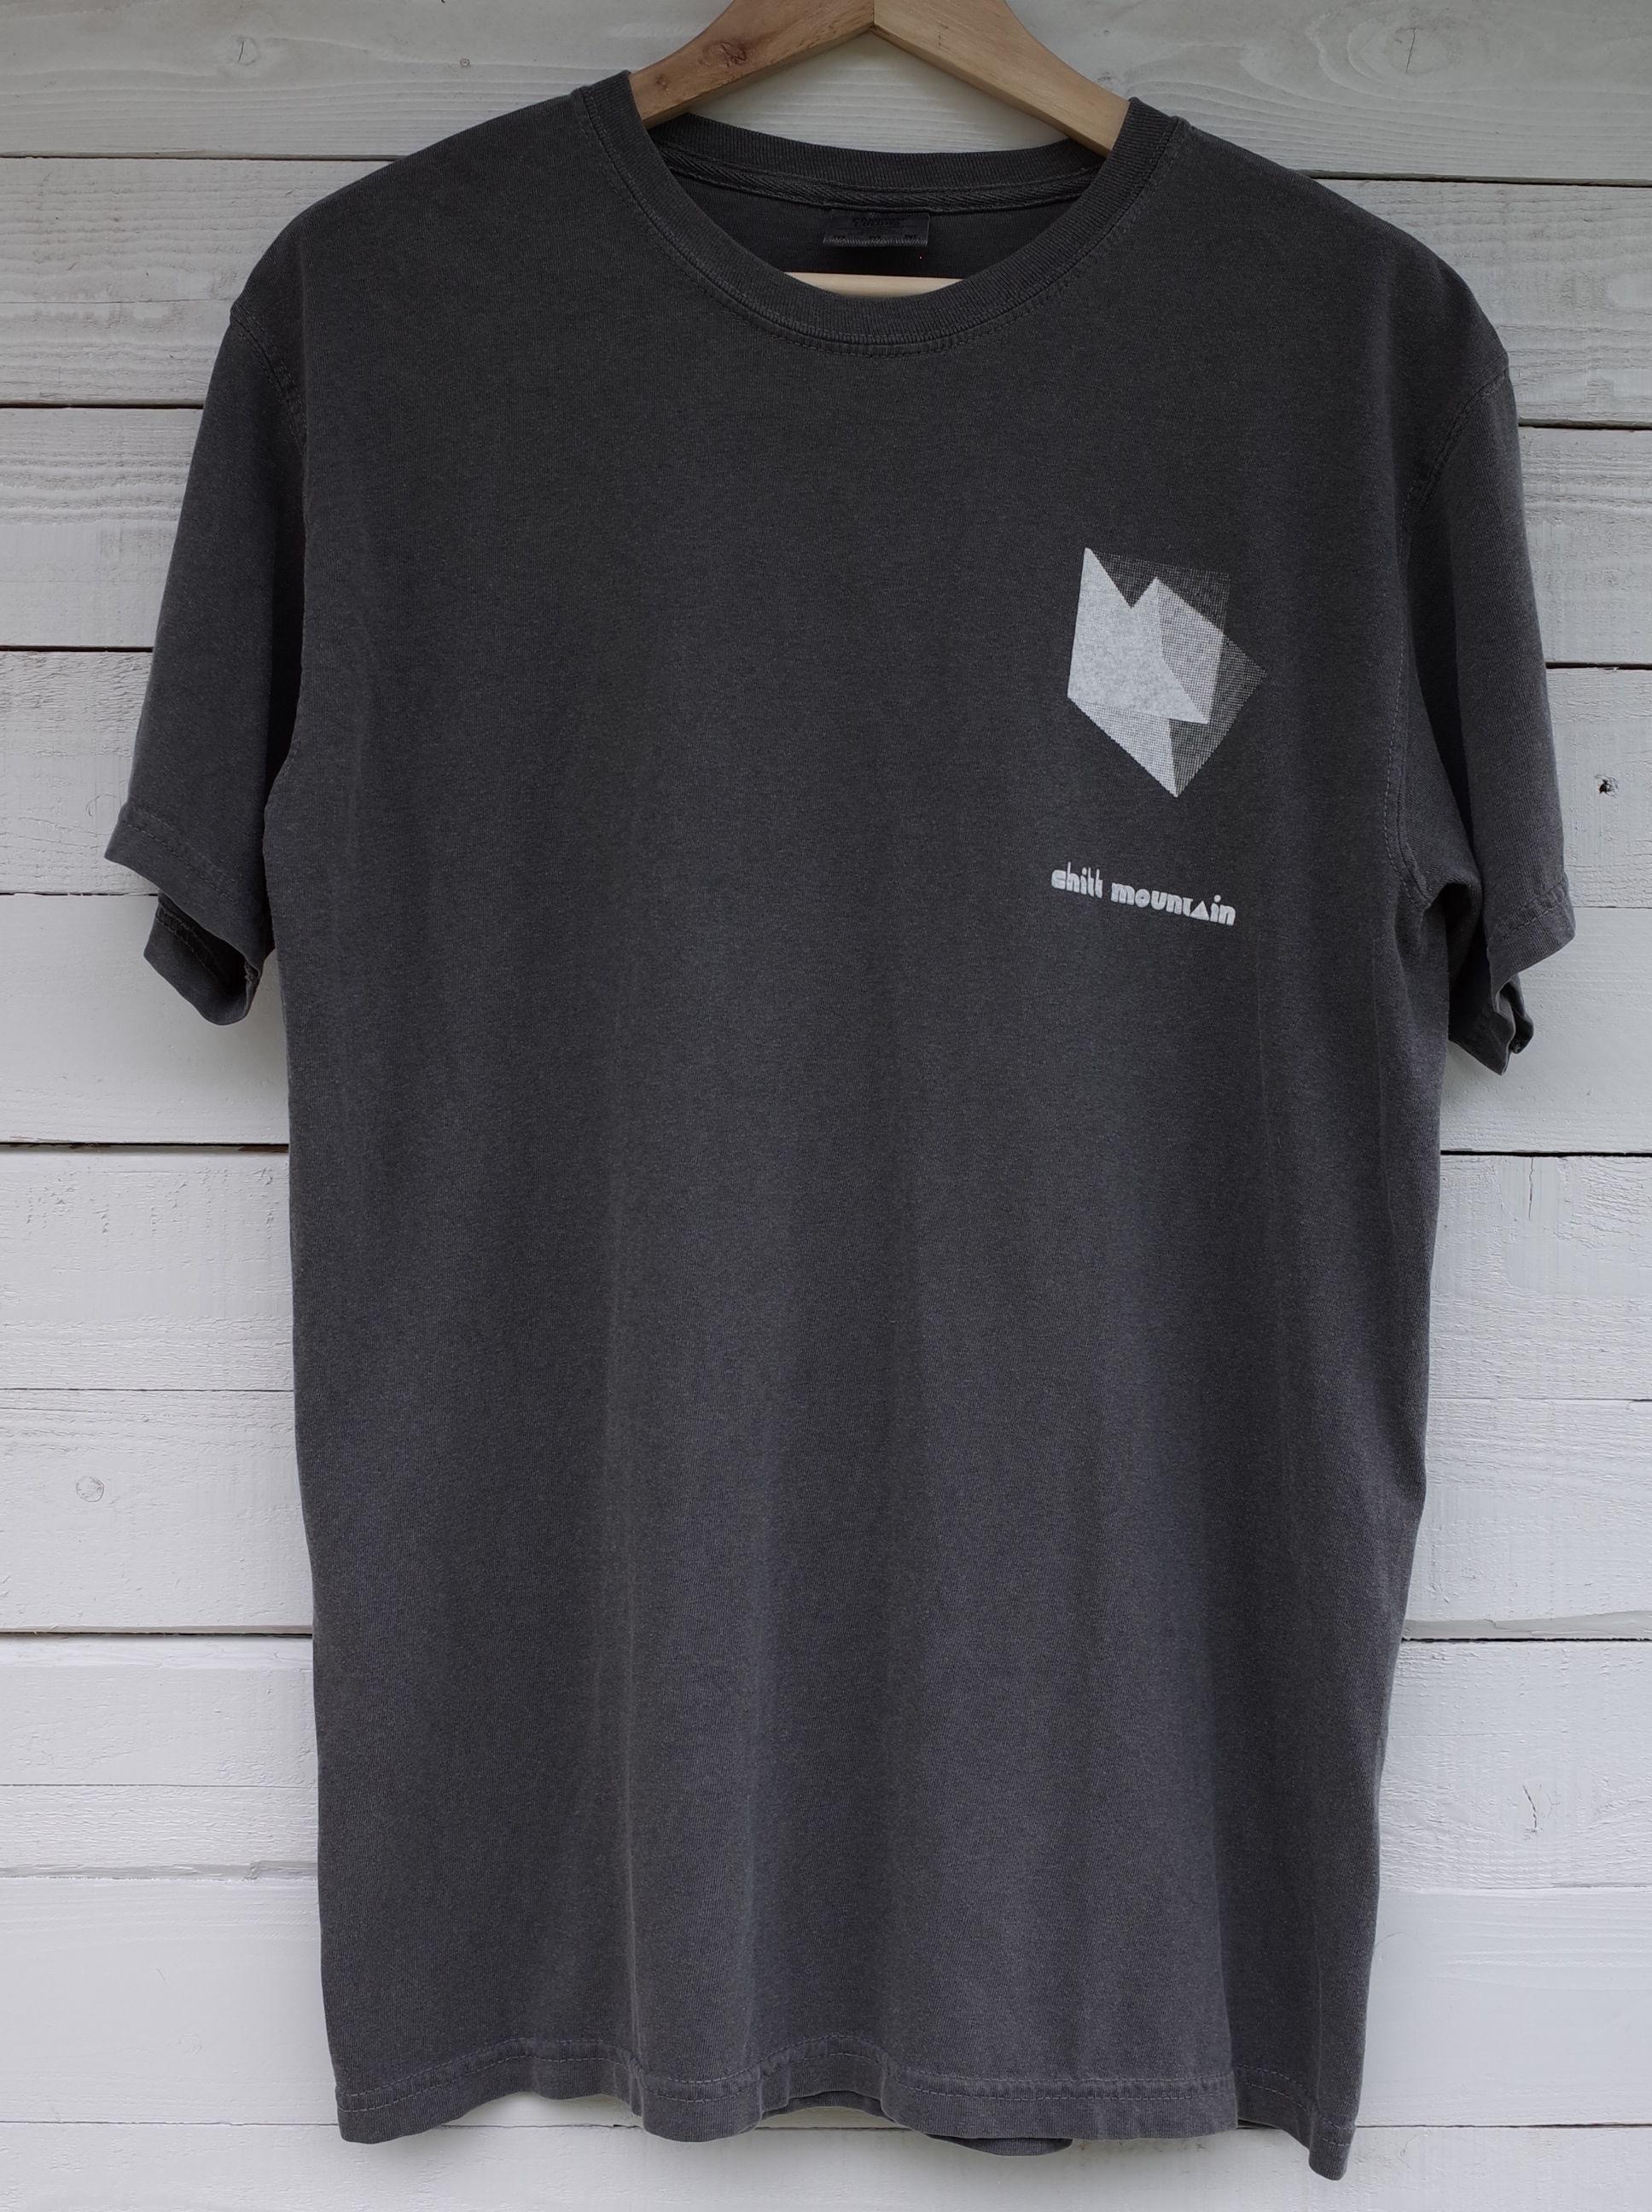 CHILL MOUNTAIN - chillmountain / Liquidanz T-shirts BLACK Size M : WEAR gallery 0